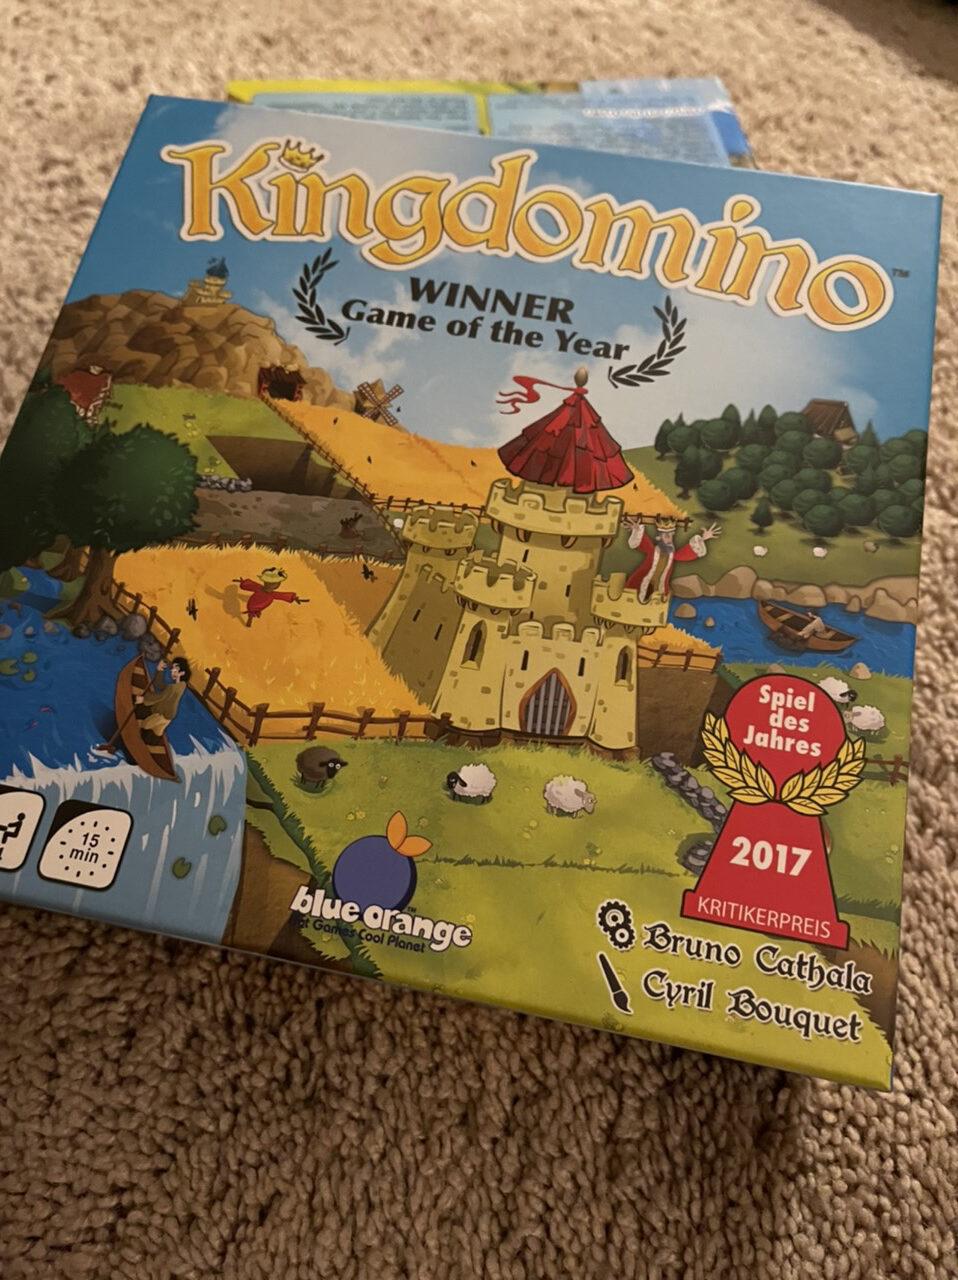 King domino game